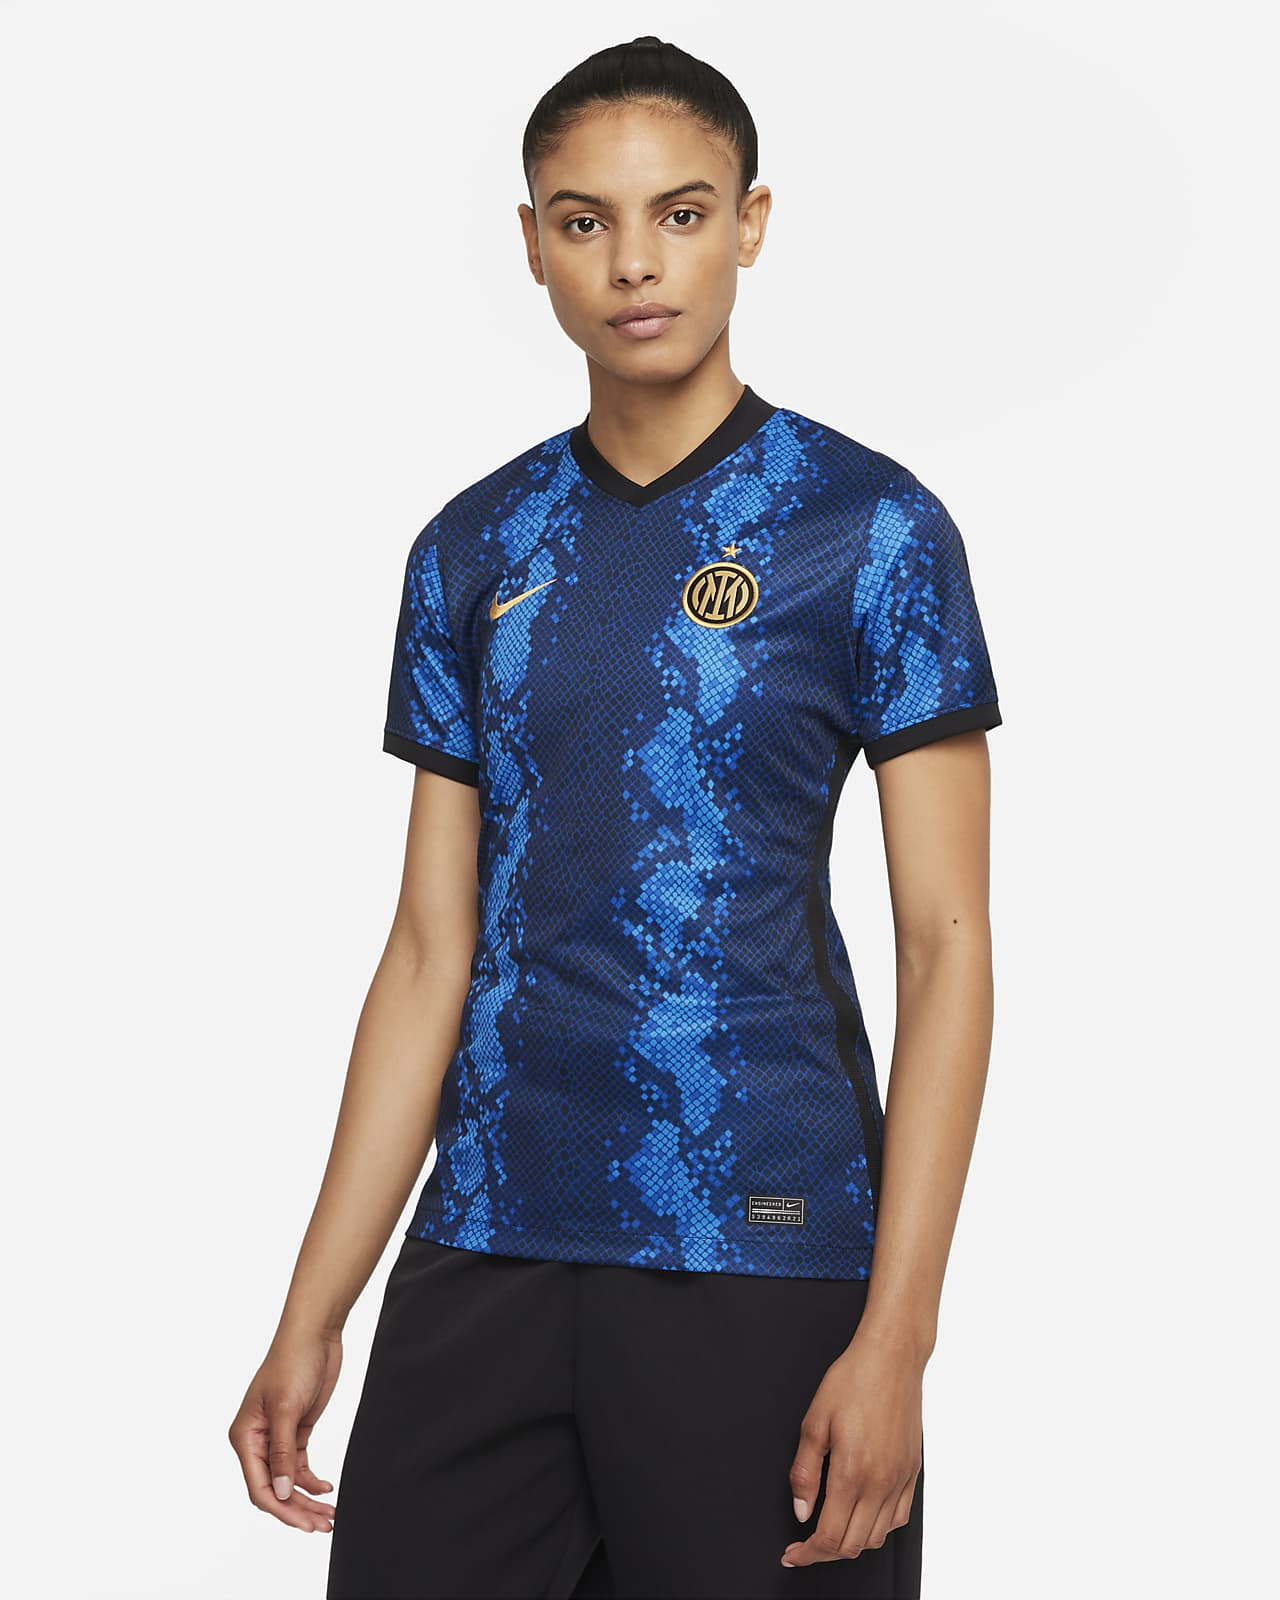 Inter Milan 2021/22 Stadium Home Women's Nike Dri-FIT Football Shirt